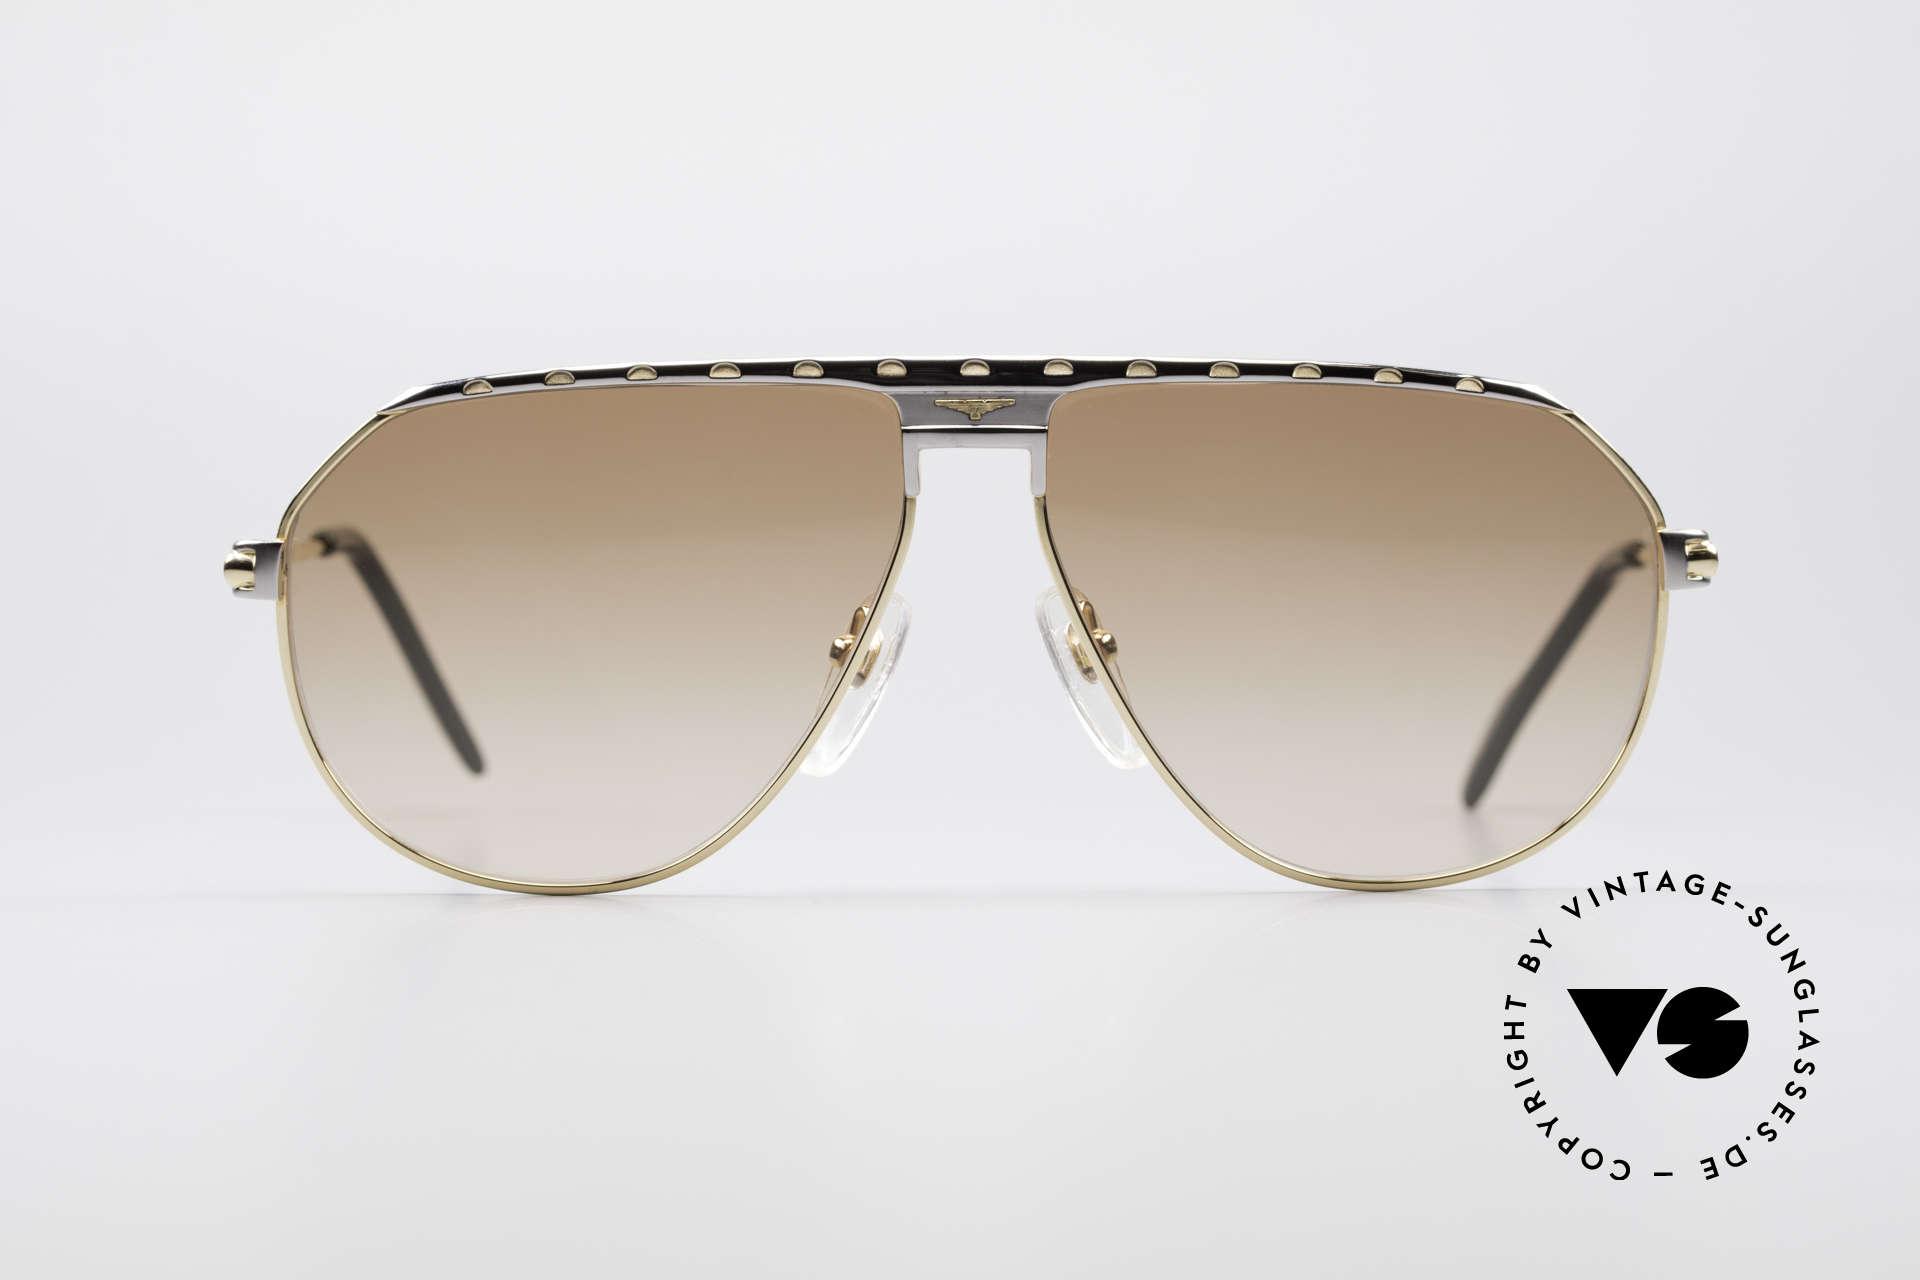 Longines 0151 Large 80's Titanium Sunglasses, high-class craftsmanship & very masculine design, Made for Men